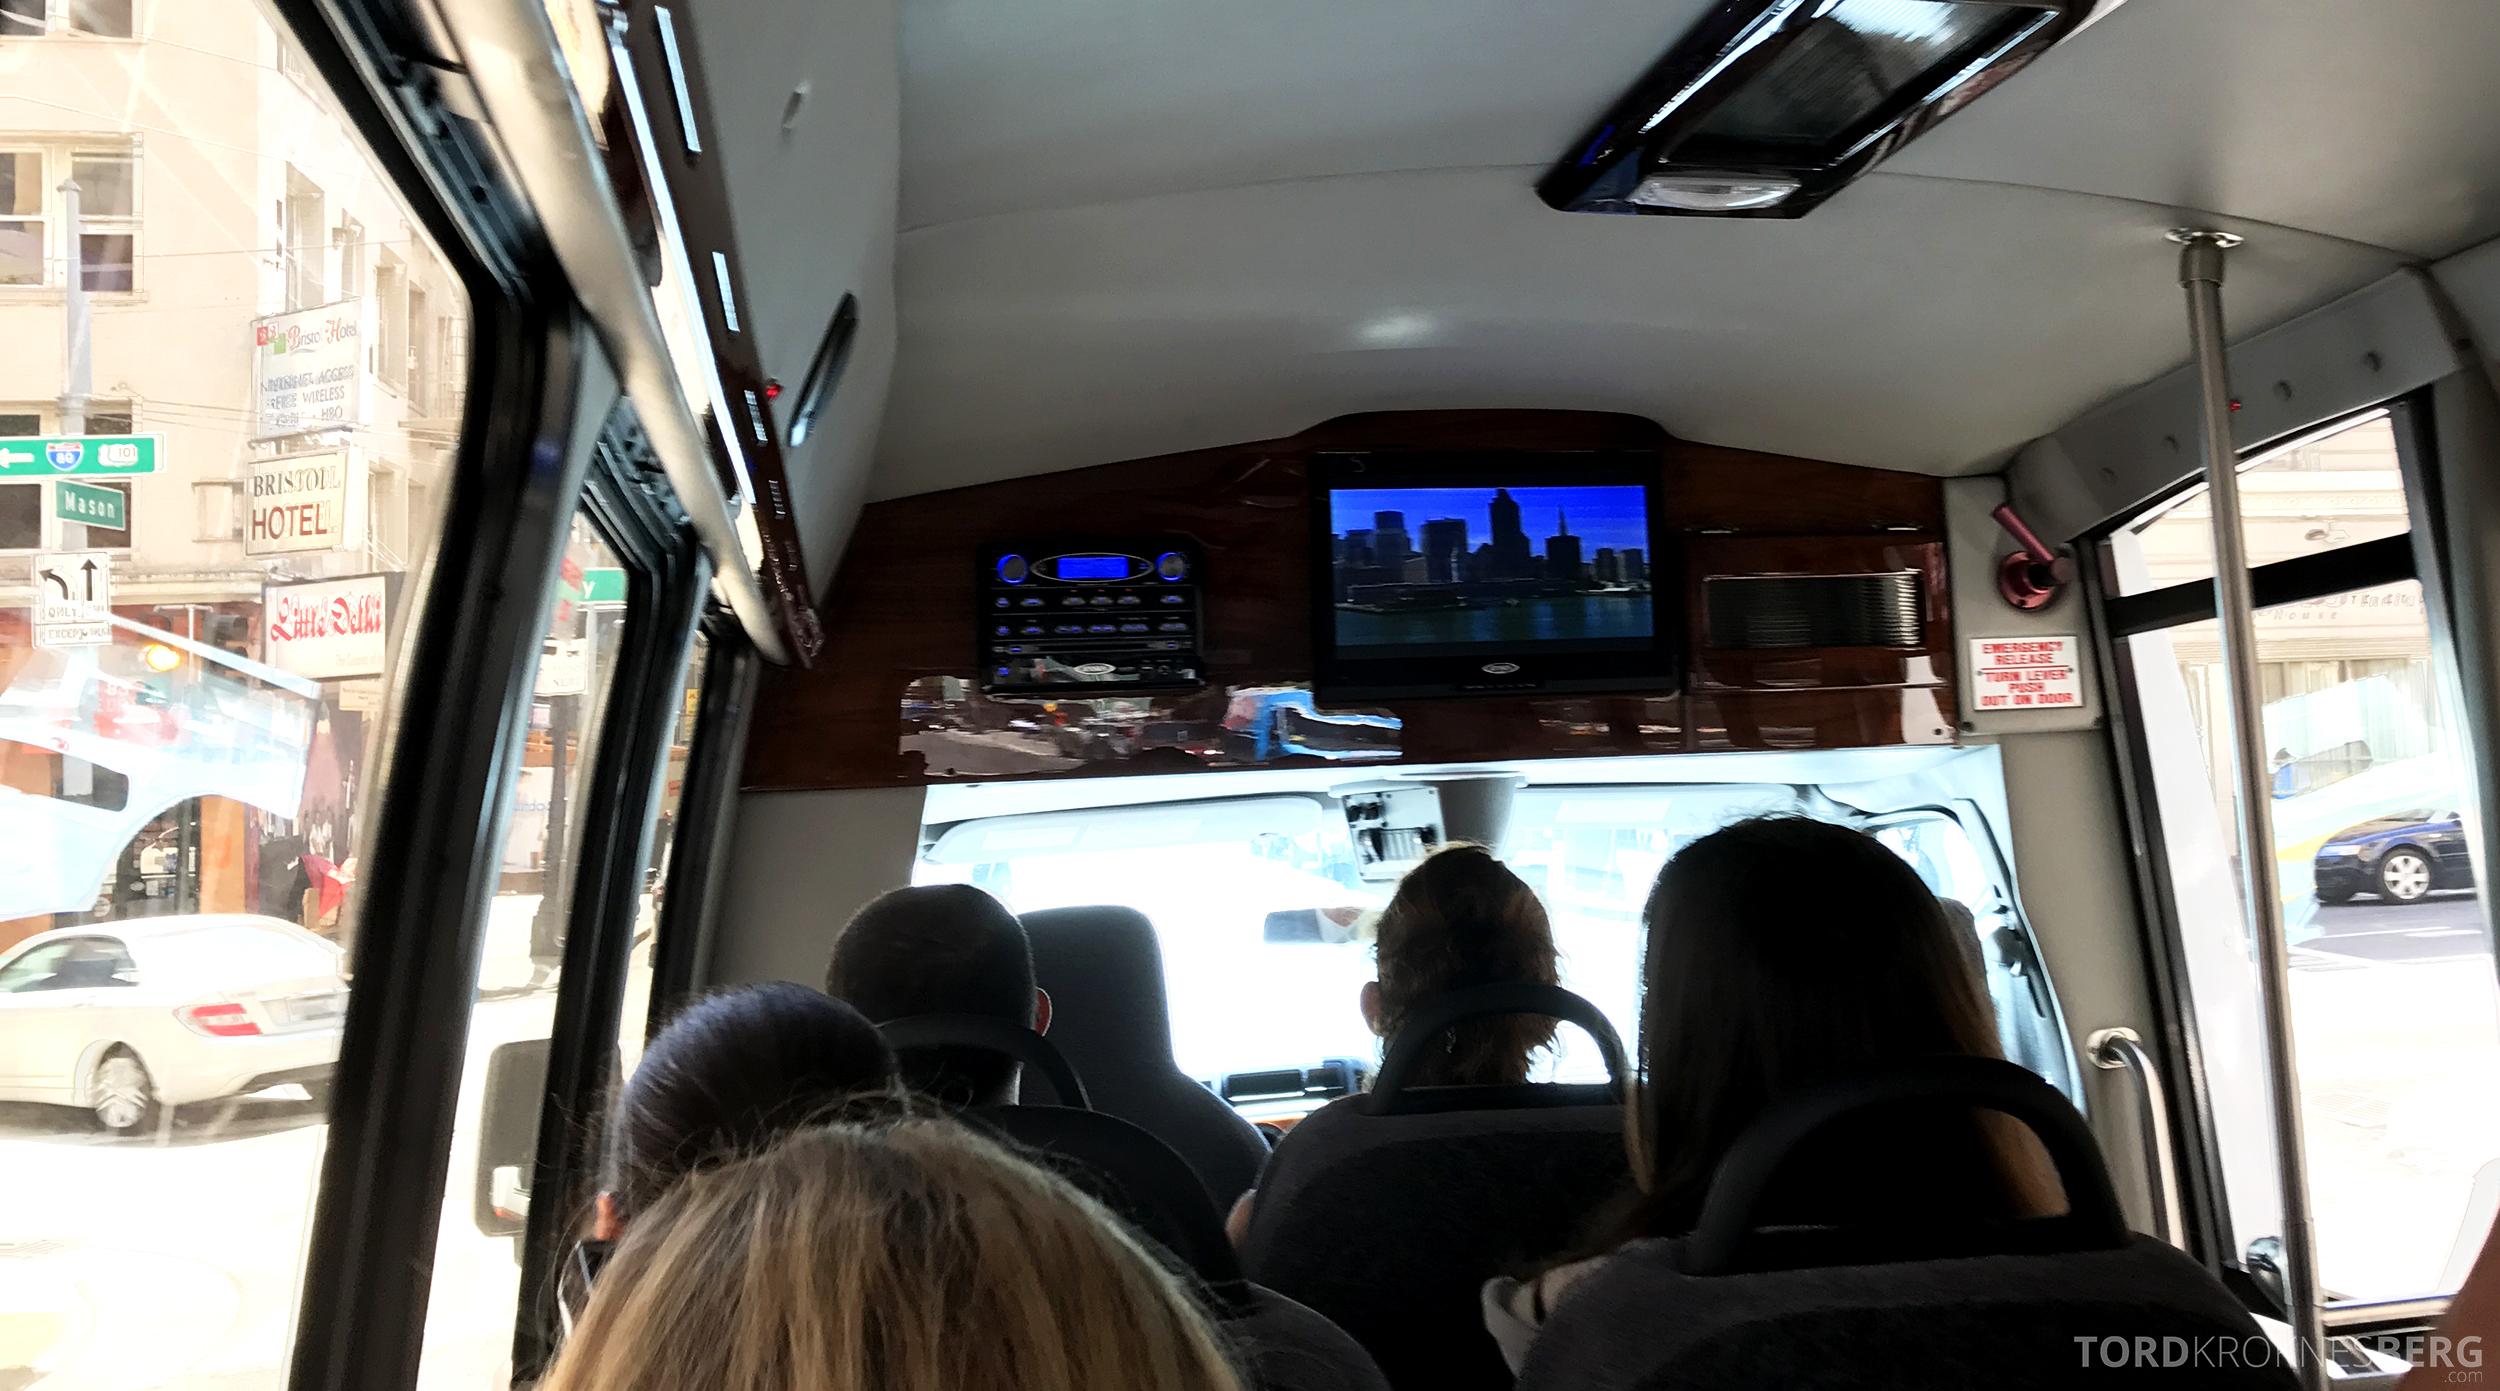 San Francisco Helicopter Tour buss